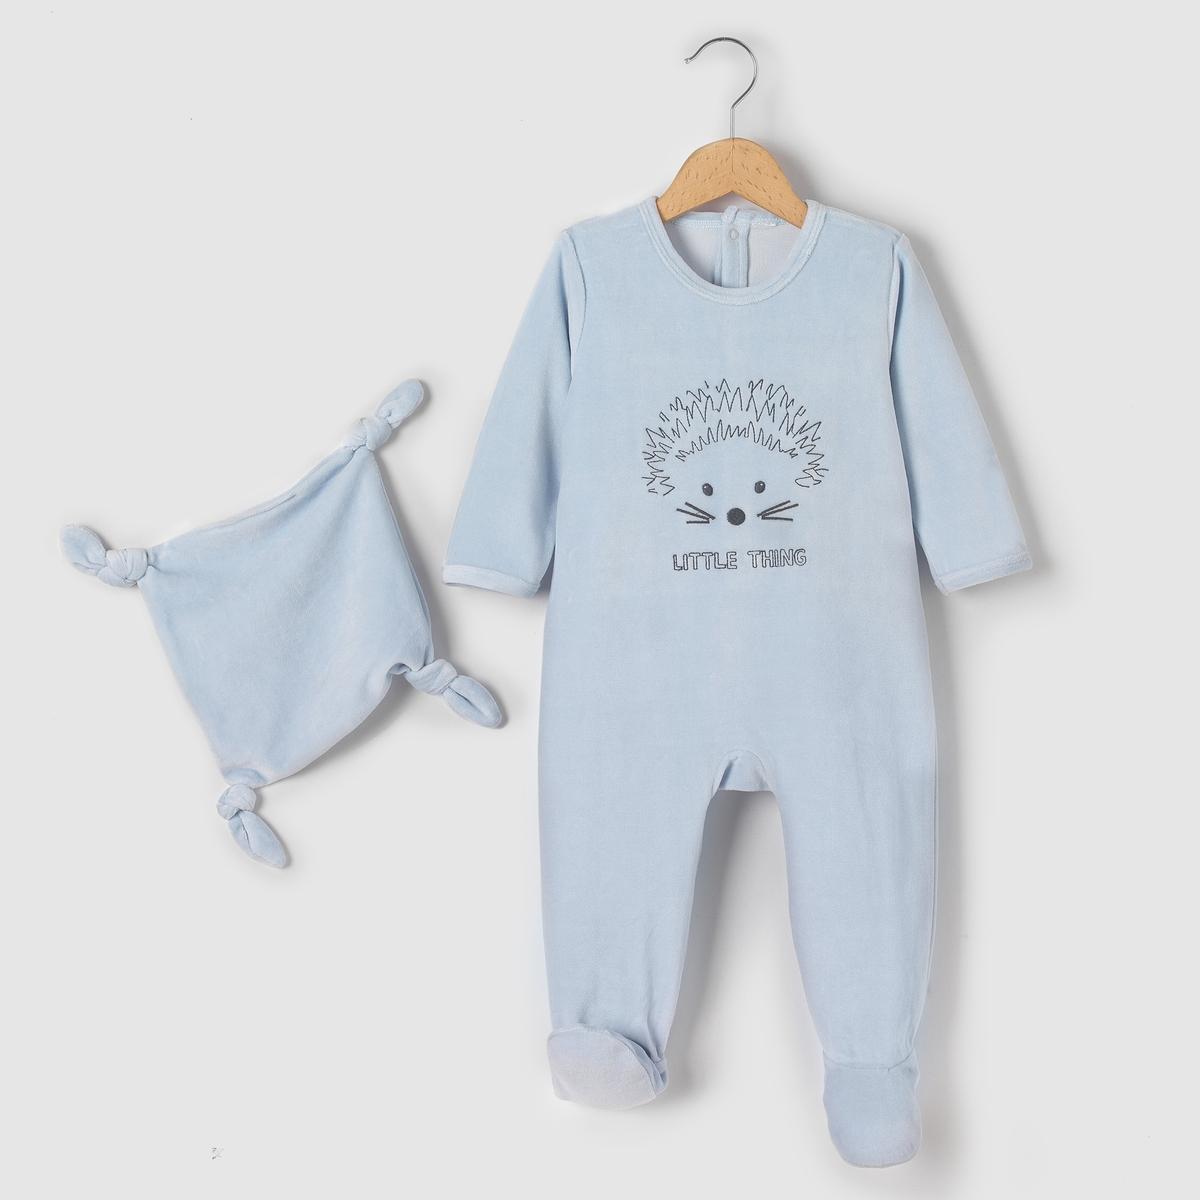 Пижама из велюра + мягкая игрушка 0 мес-3 лет